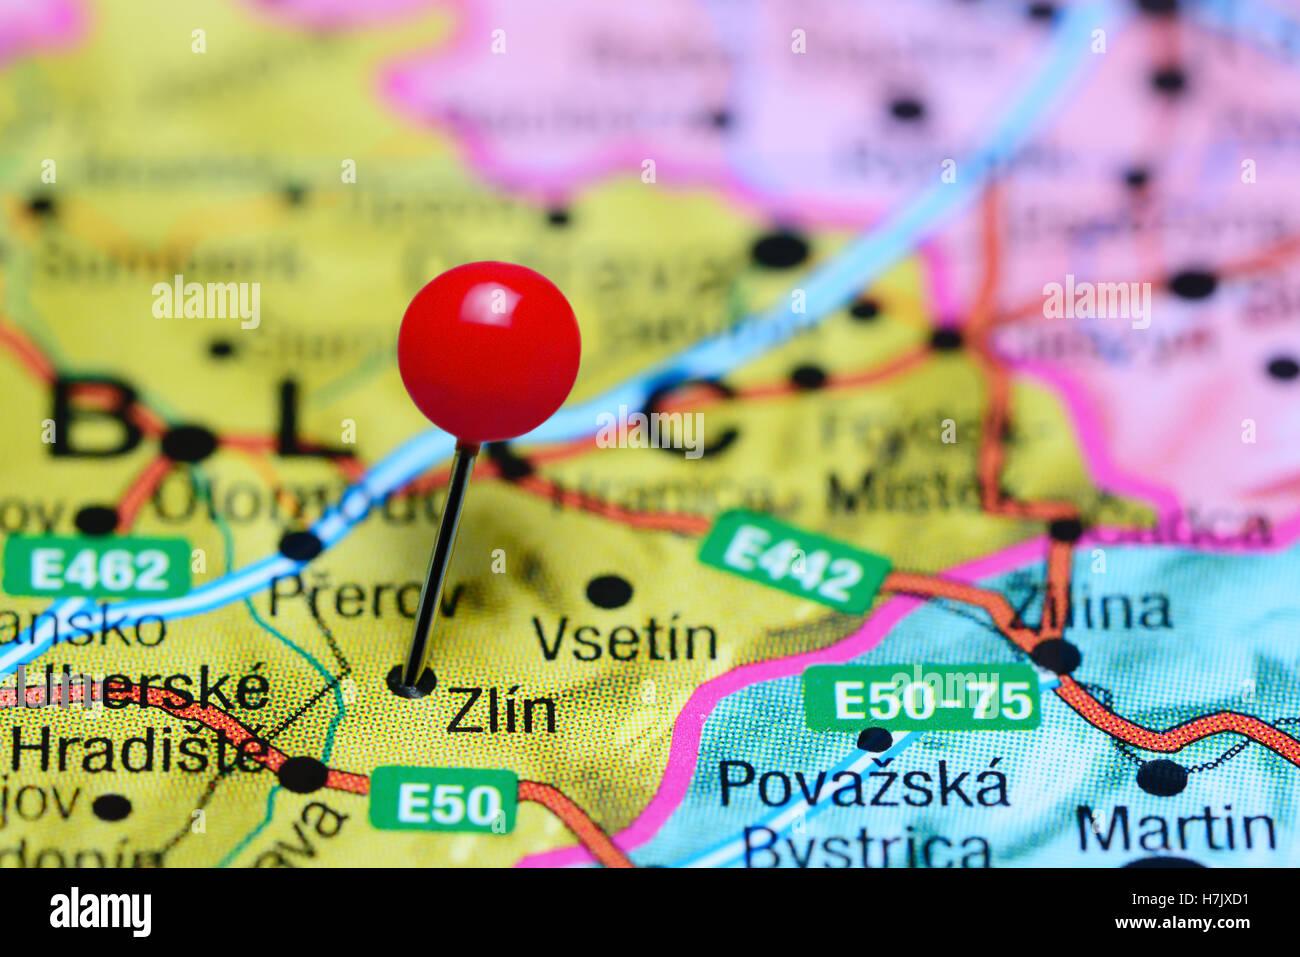 Zlin pinned on a map of Czech Republic - Stock Image